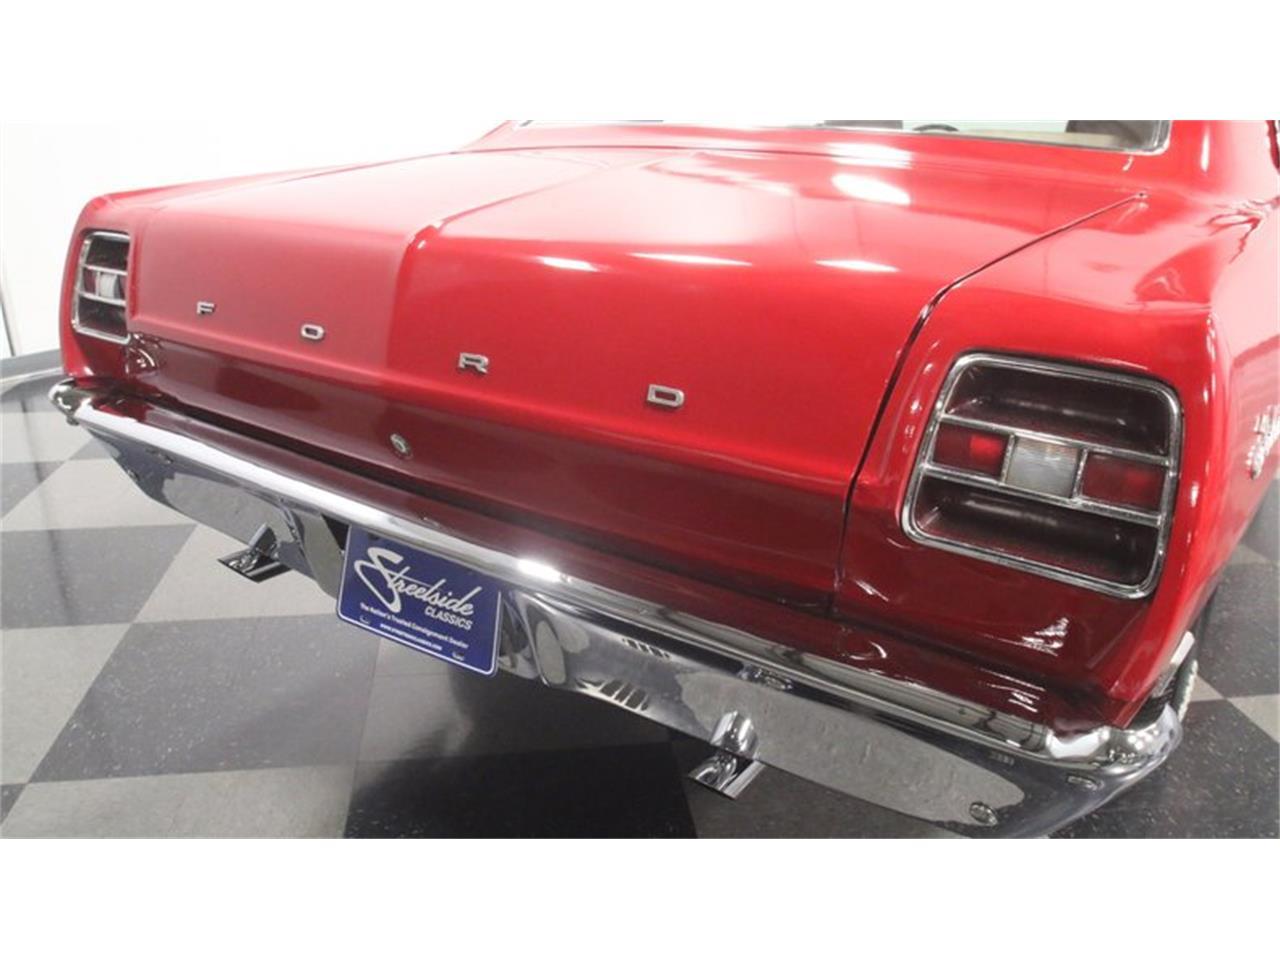 1969 Ford Fairlane (CC-1154620) for sale in Lithia Springs, Georgia